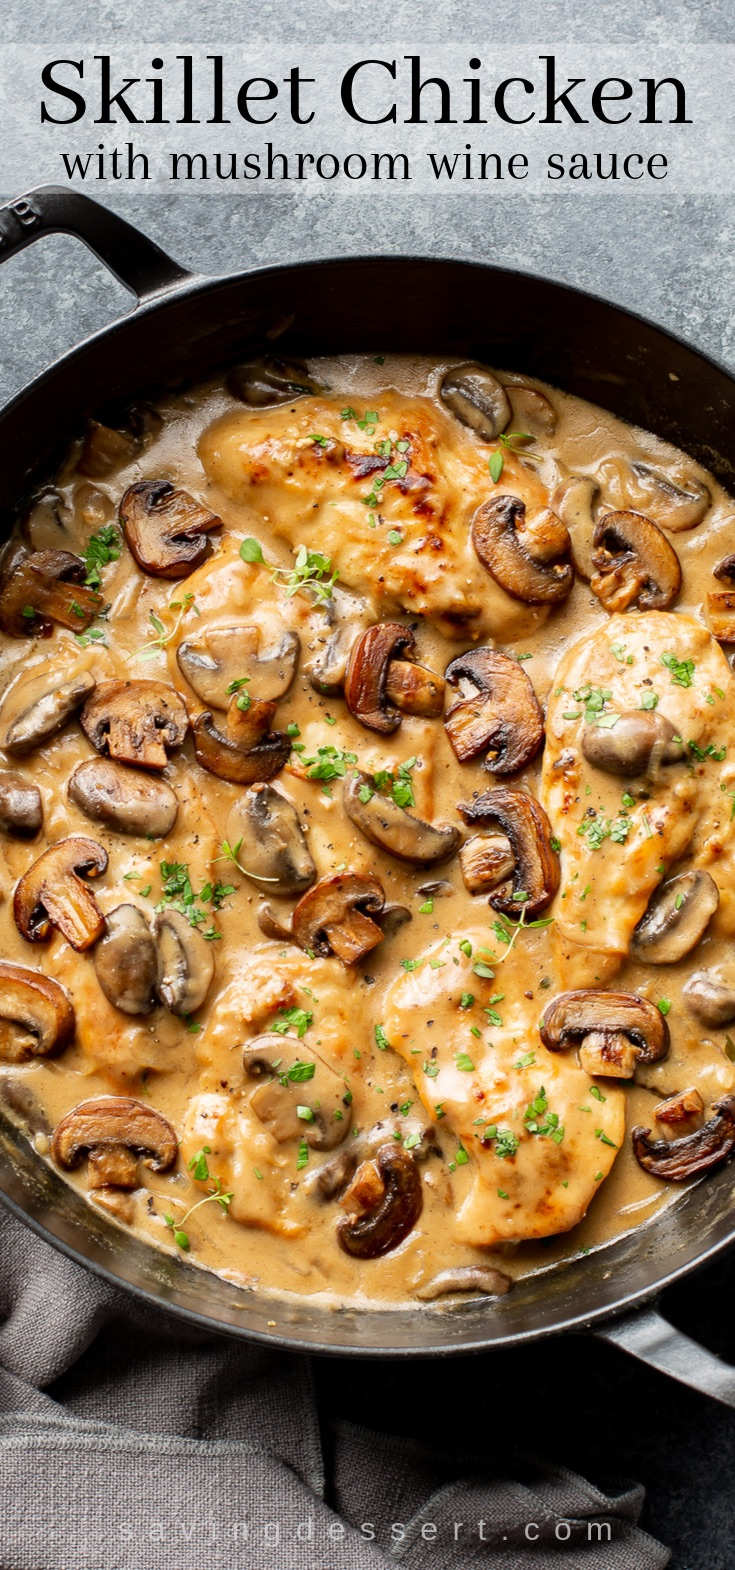 Skillet Chicken and Mushroom Wine Sauce - Saving Room for Dessert